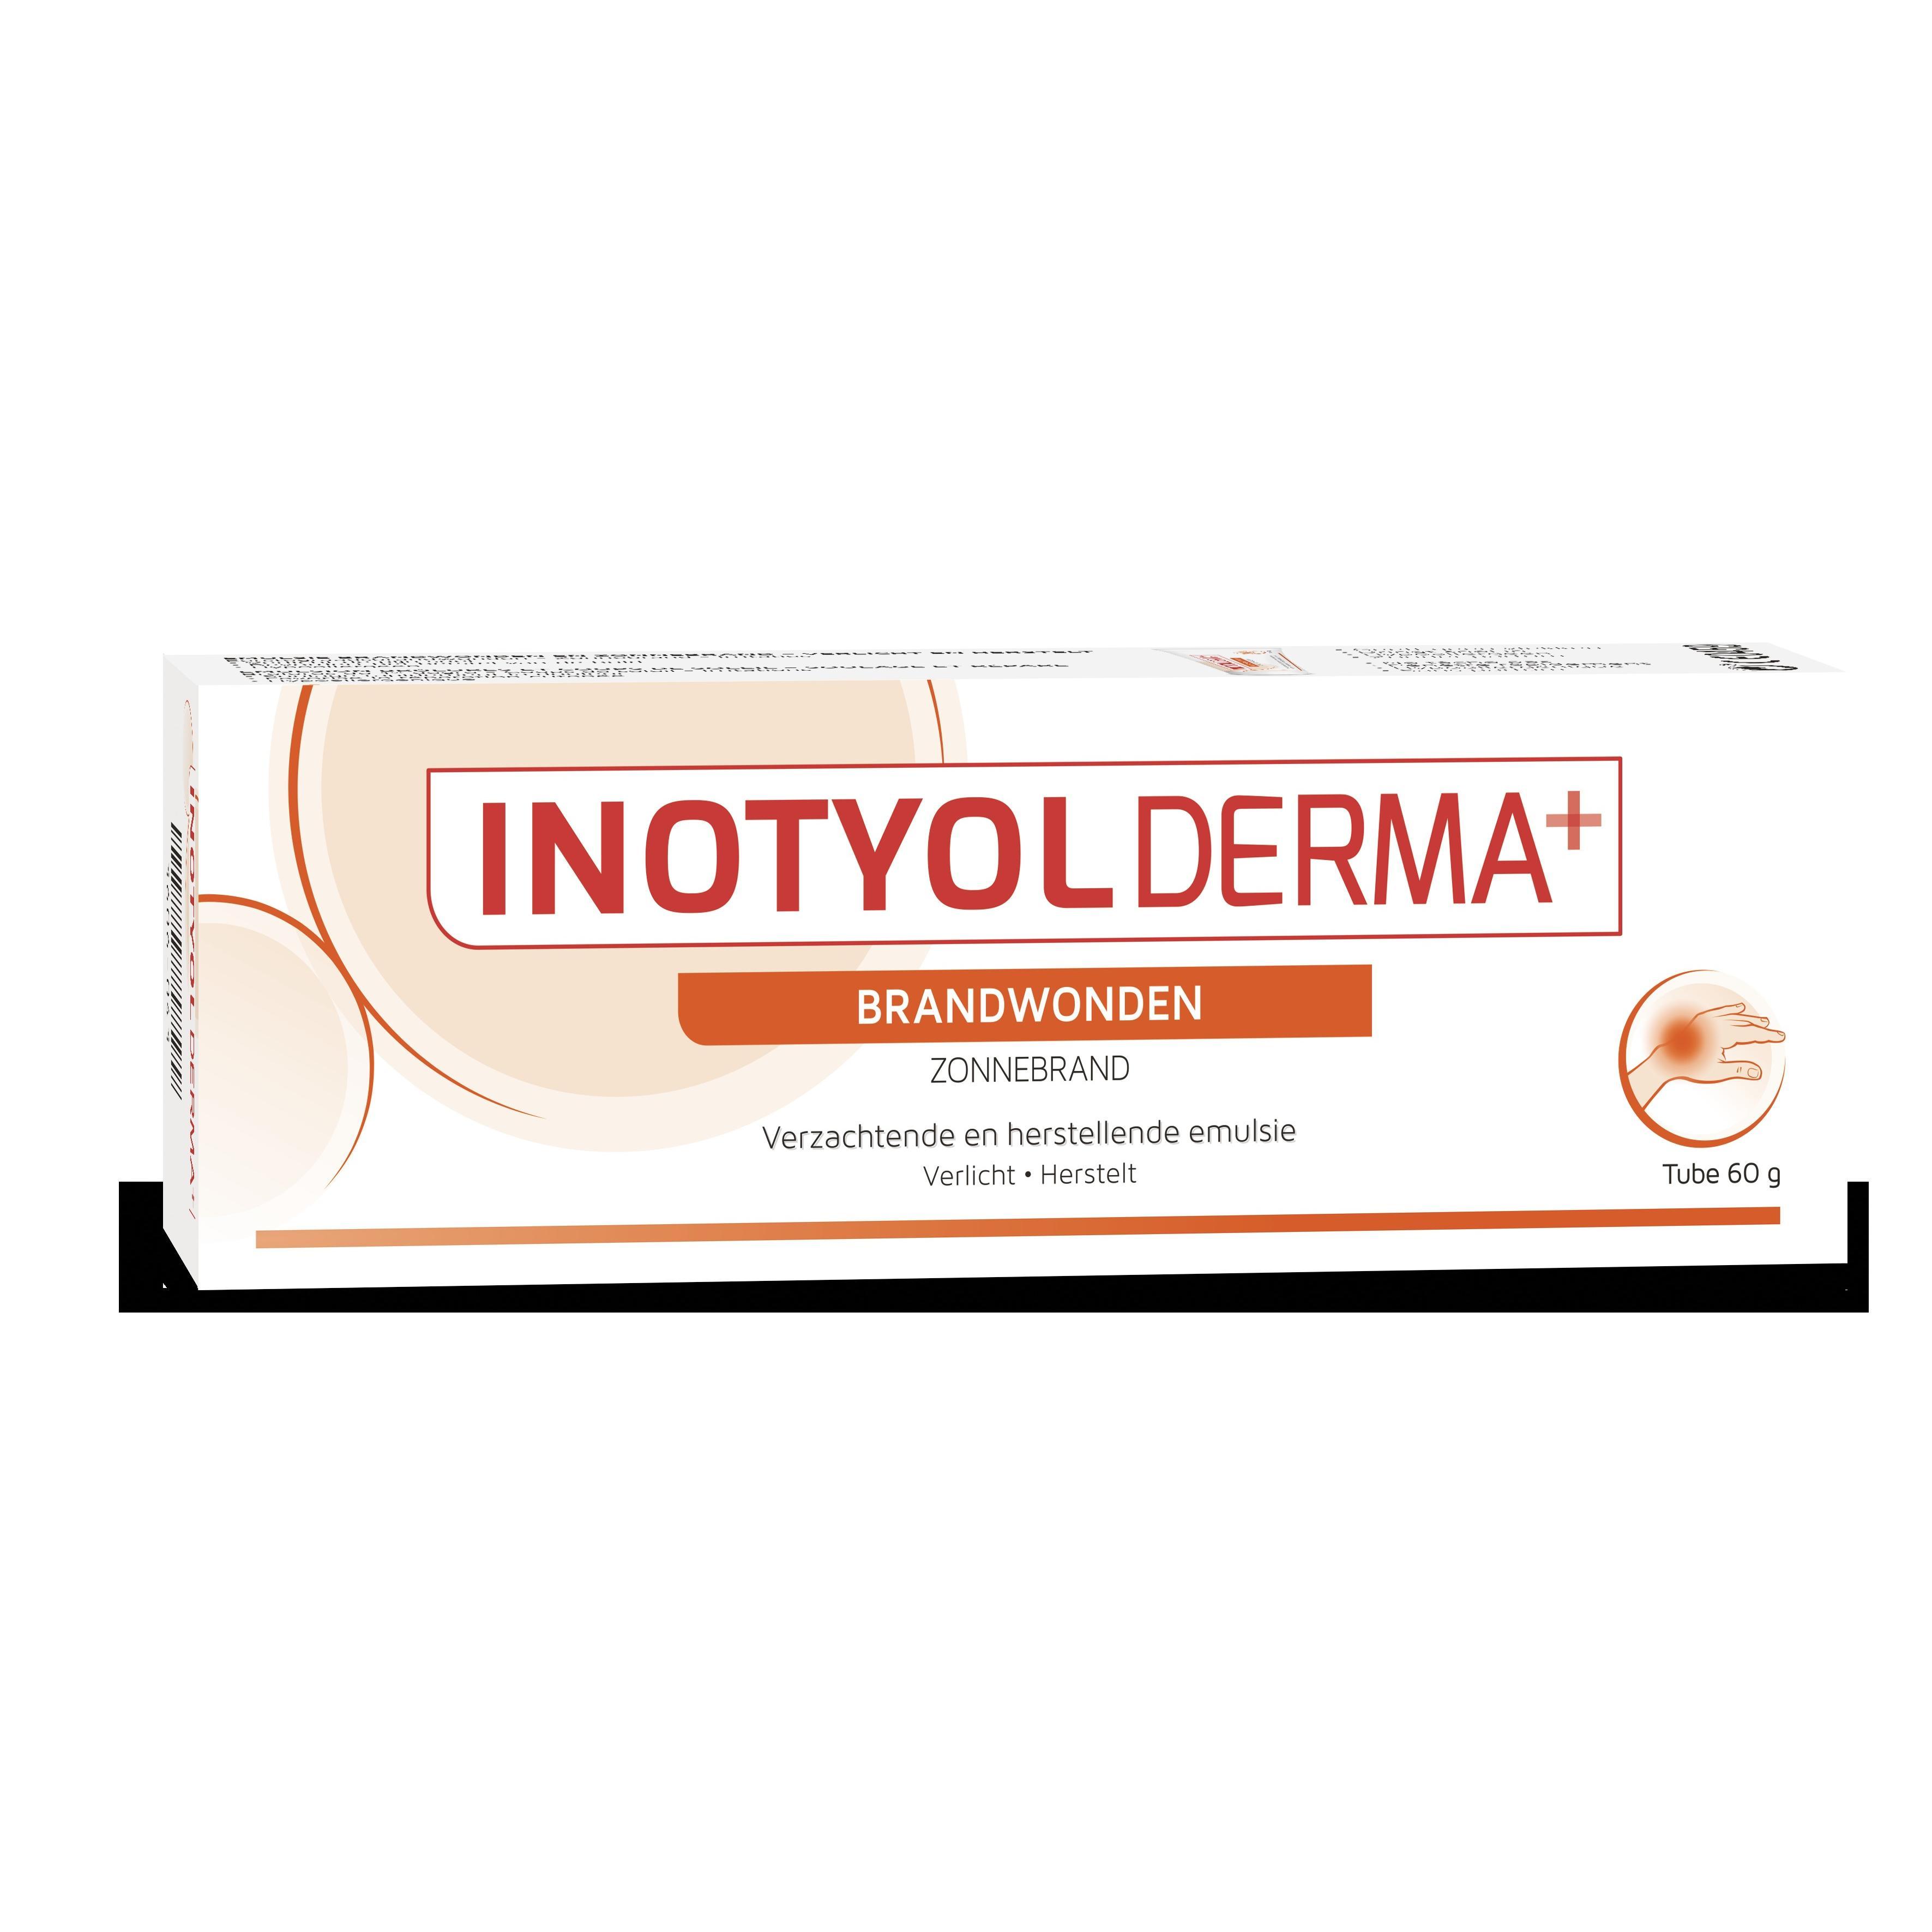 Inotyol Derma+ Brandwonden Emulsie